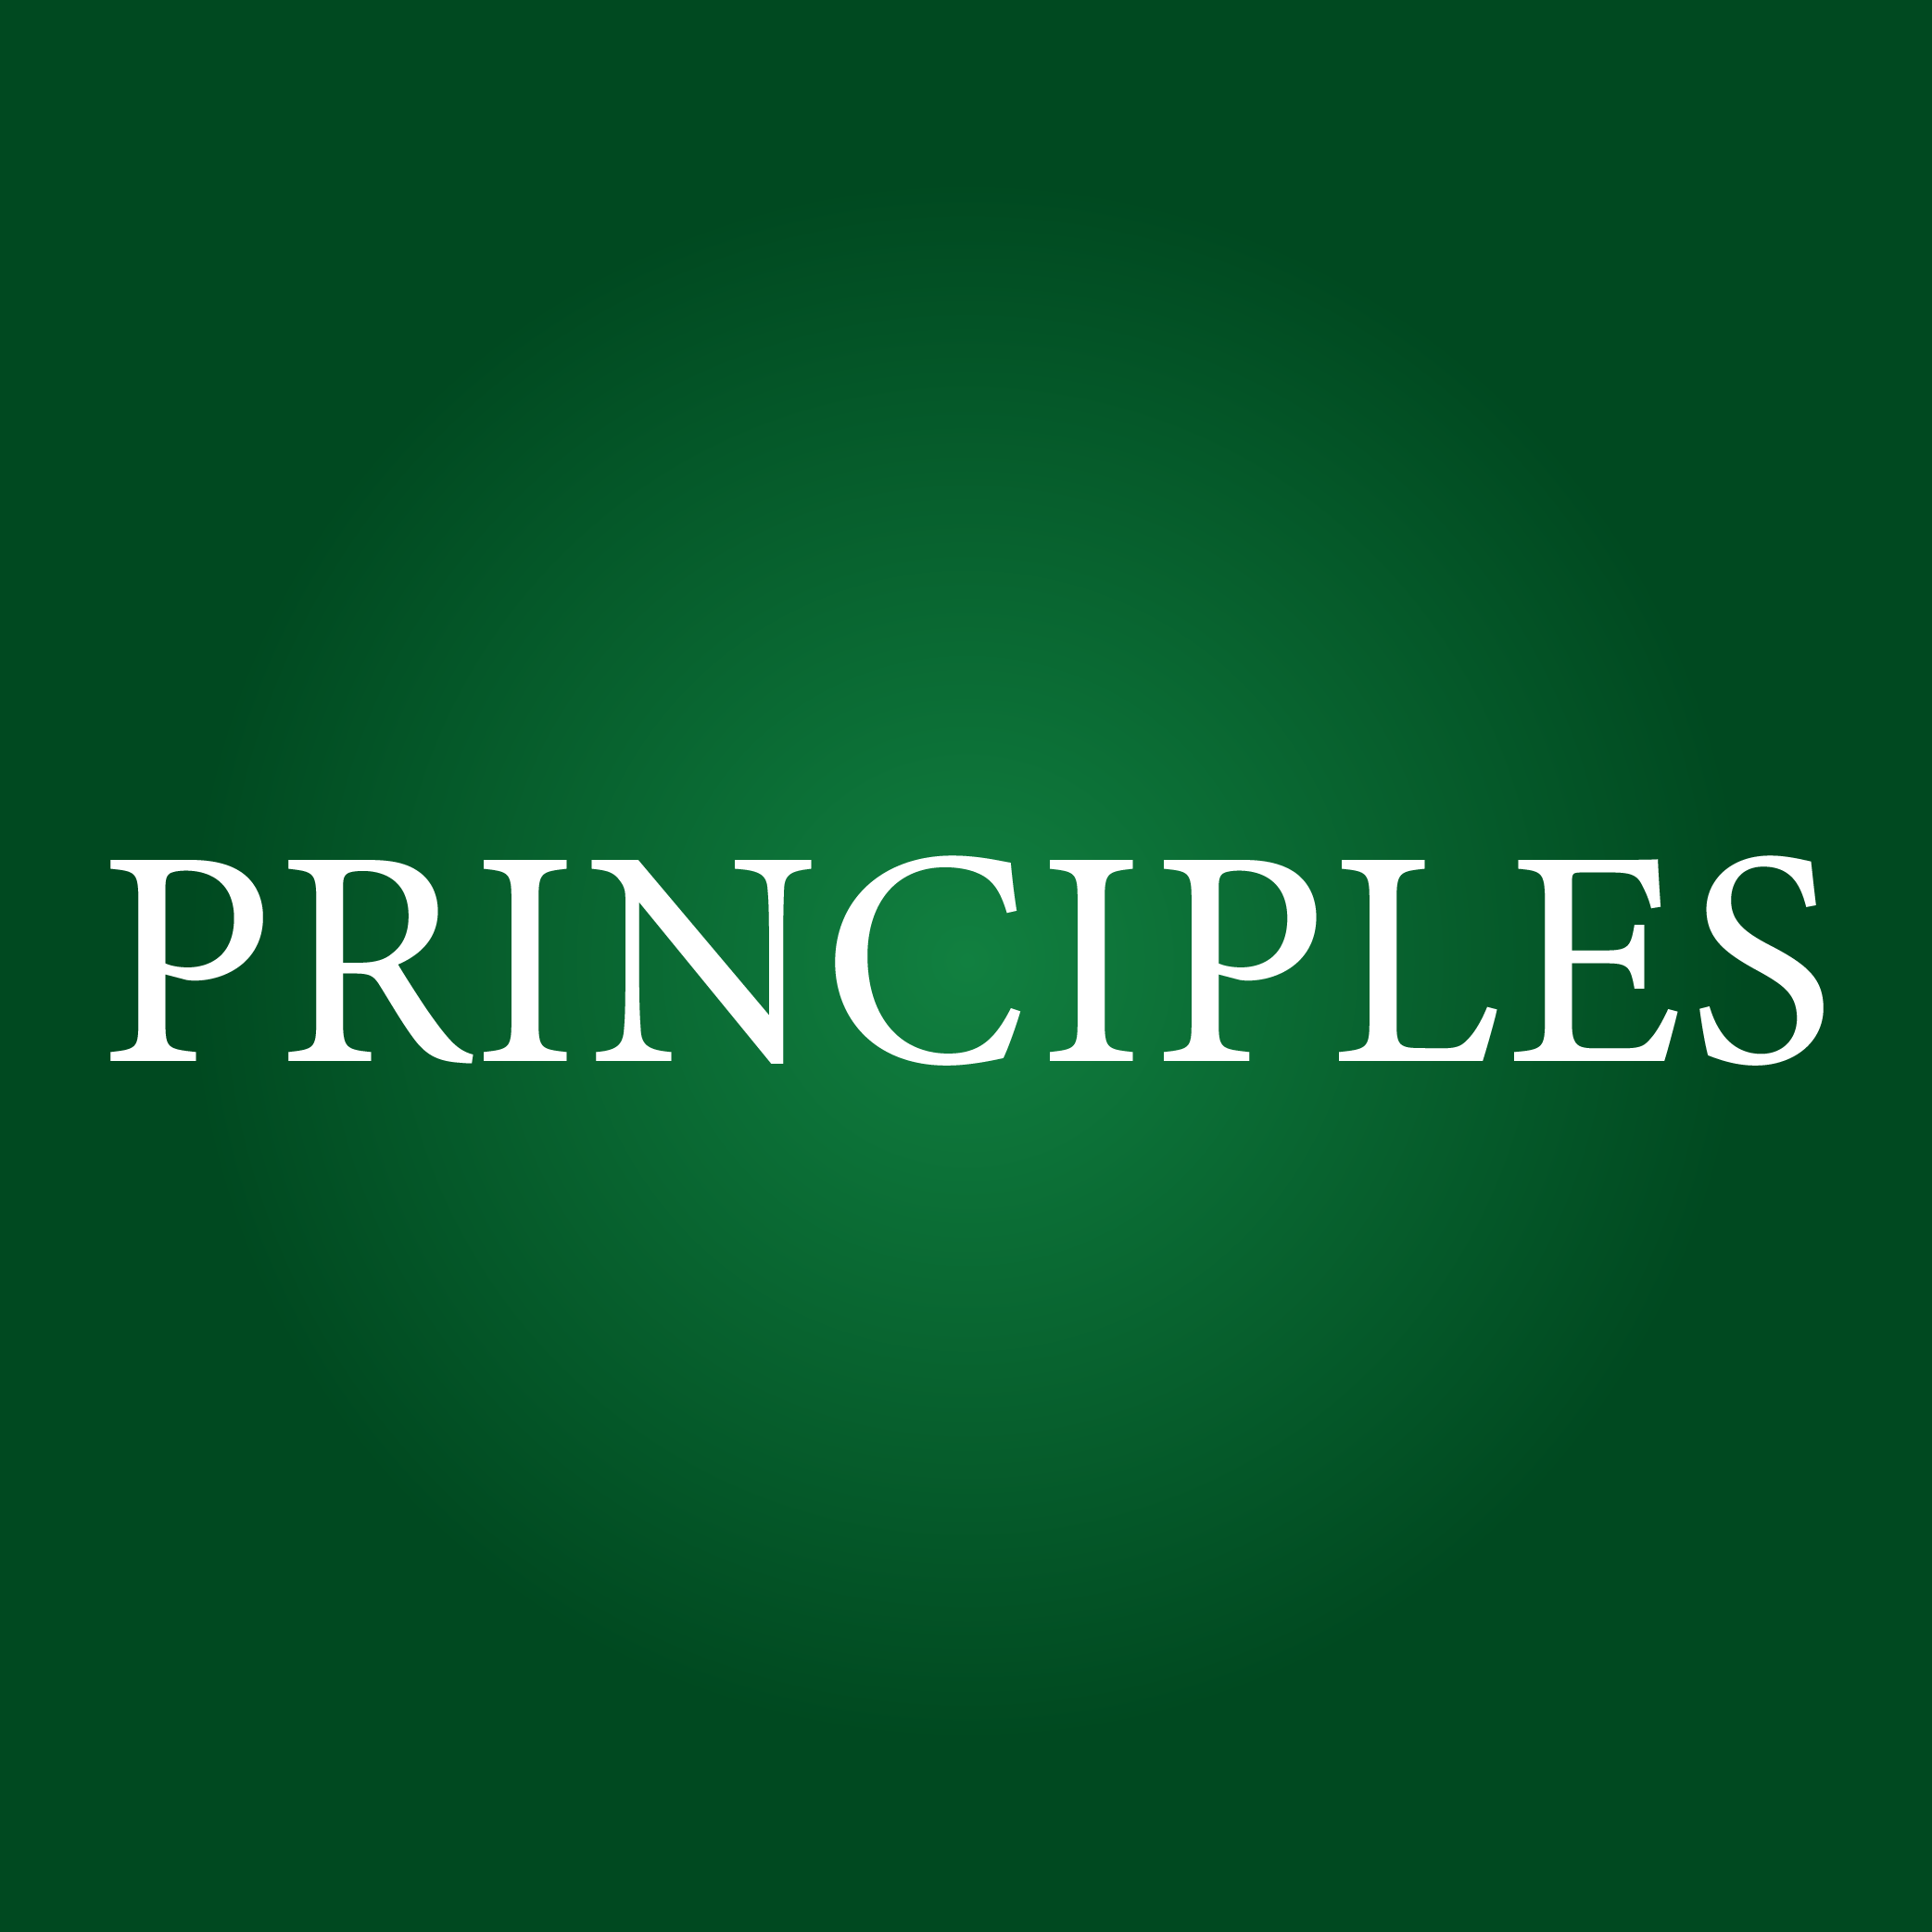 JT ICONS_PRINCIPLES 1-07